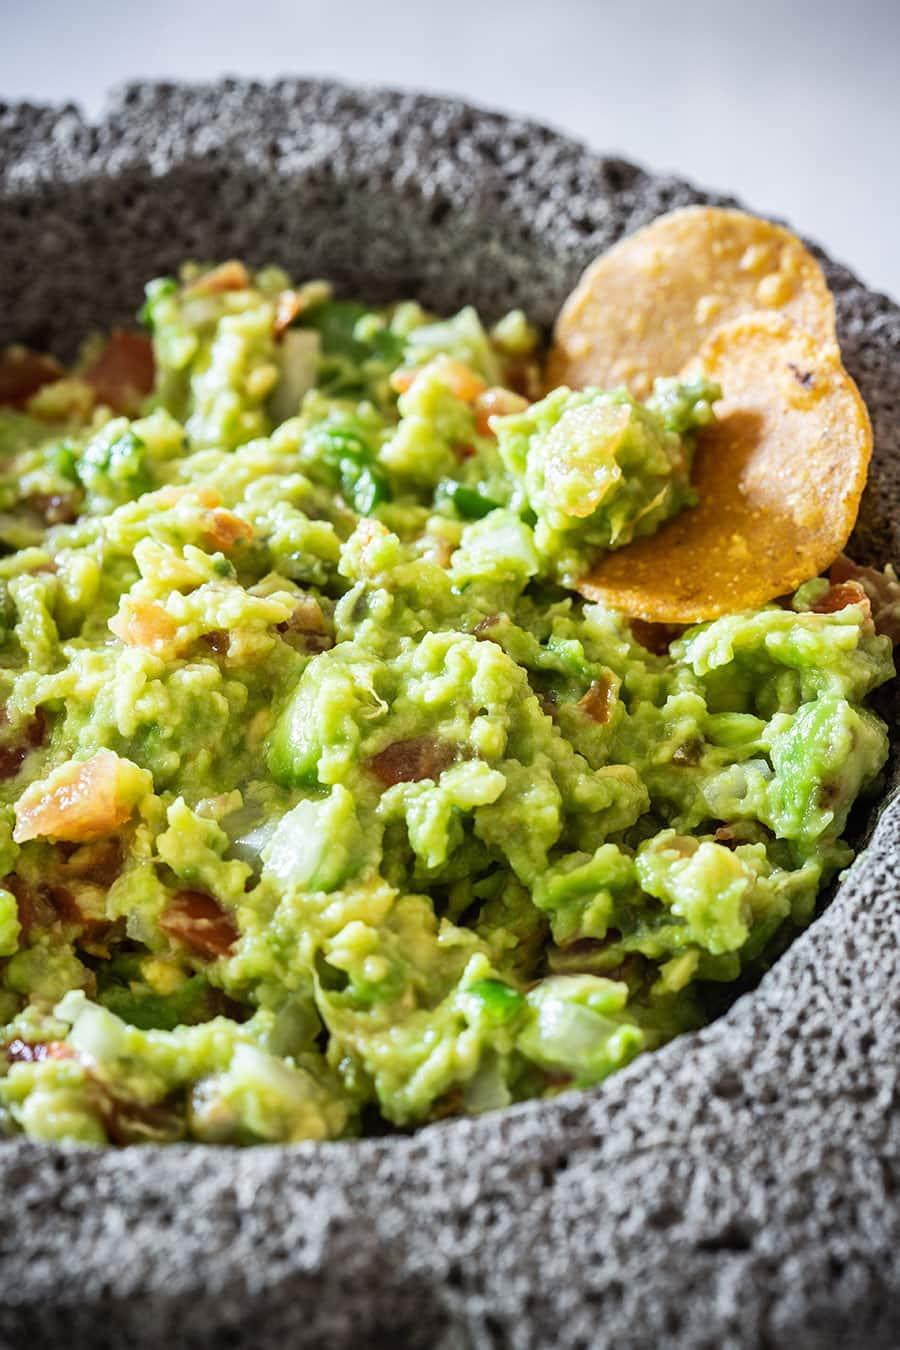 A close up of guacamole recipe on molcajete.